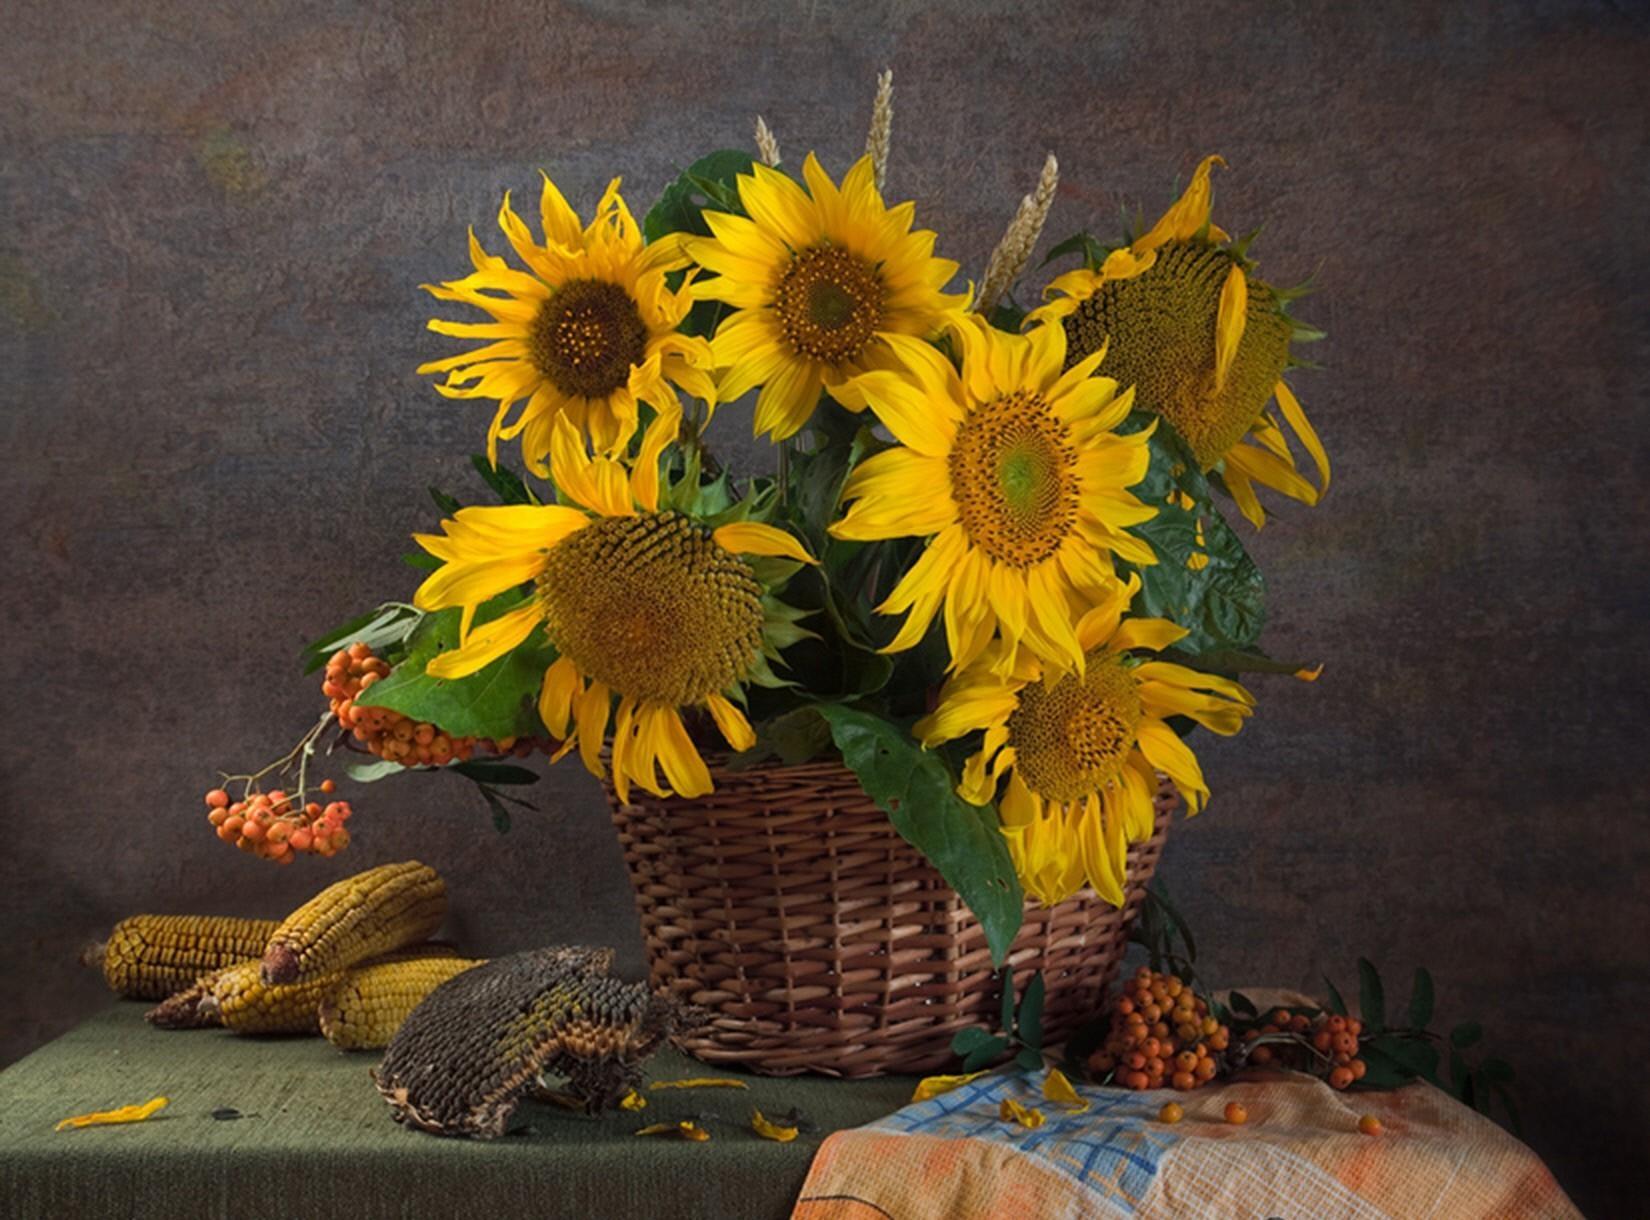 61003 скачать обои Рябина, Подсолнухи, Цветы, Натюрморт, Корзина, Семечки, Кукуруза - заставки и картинки бесплатно